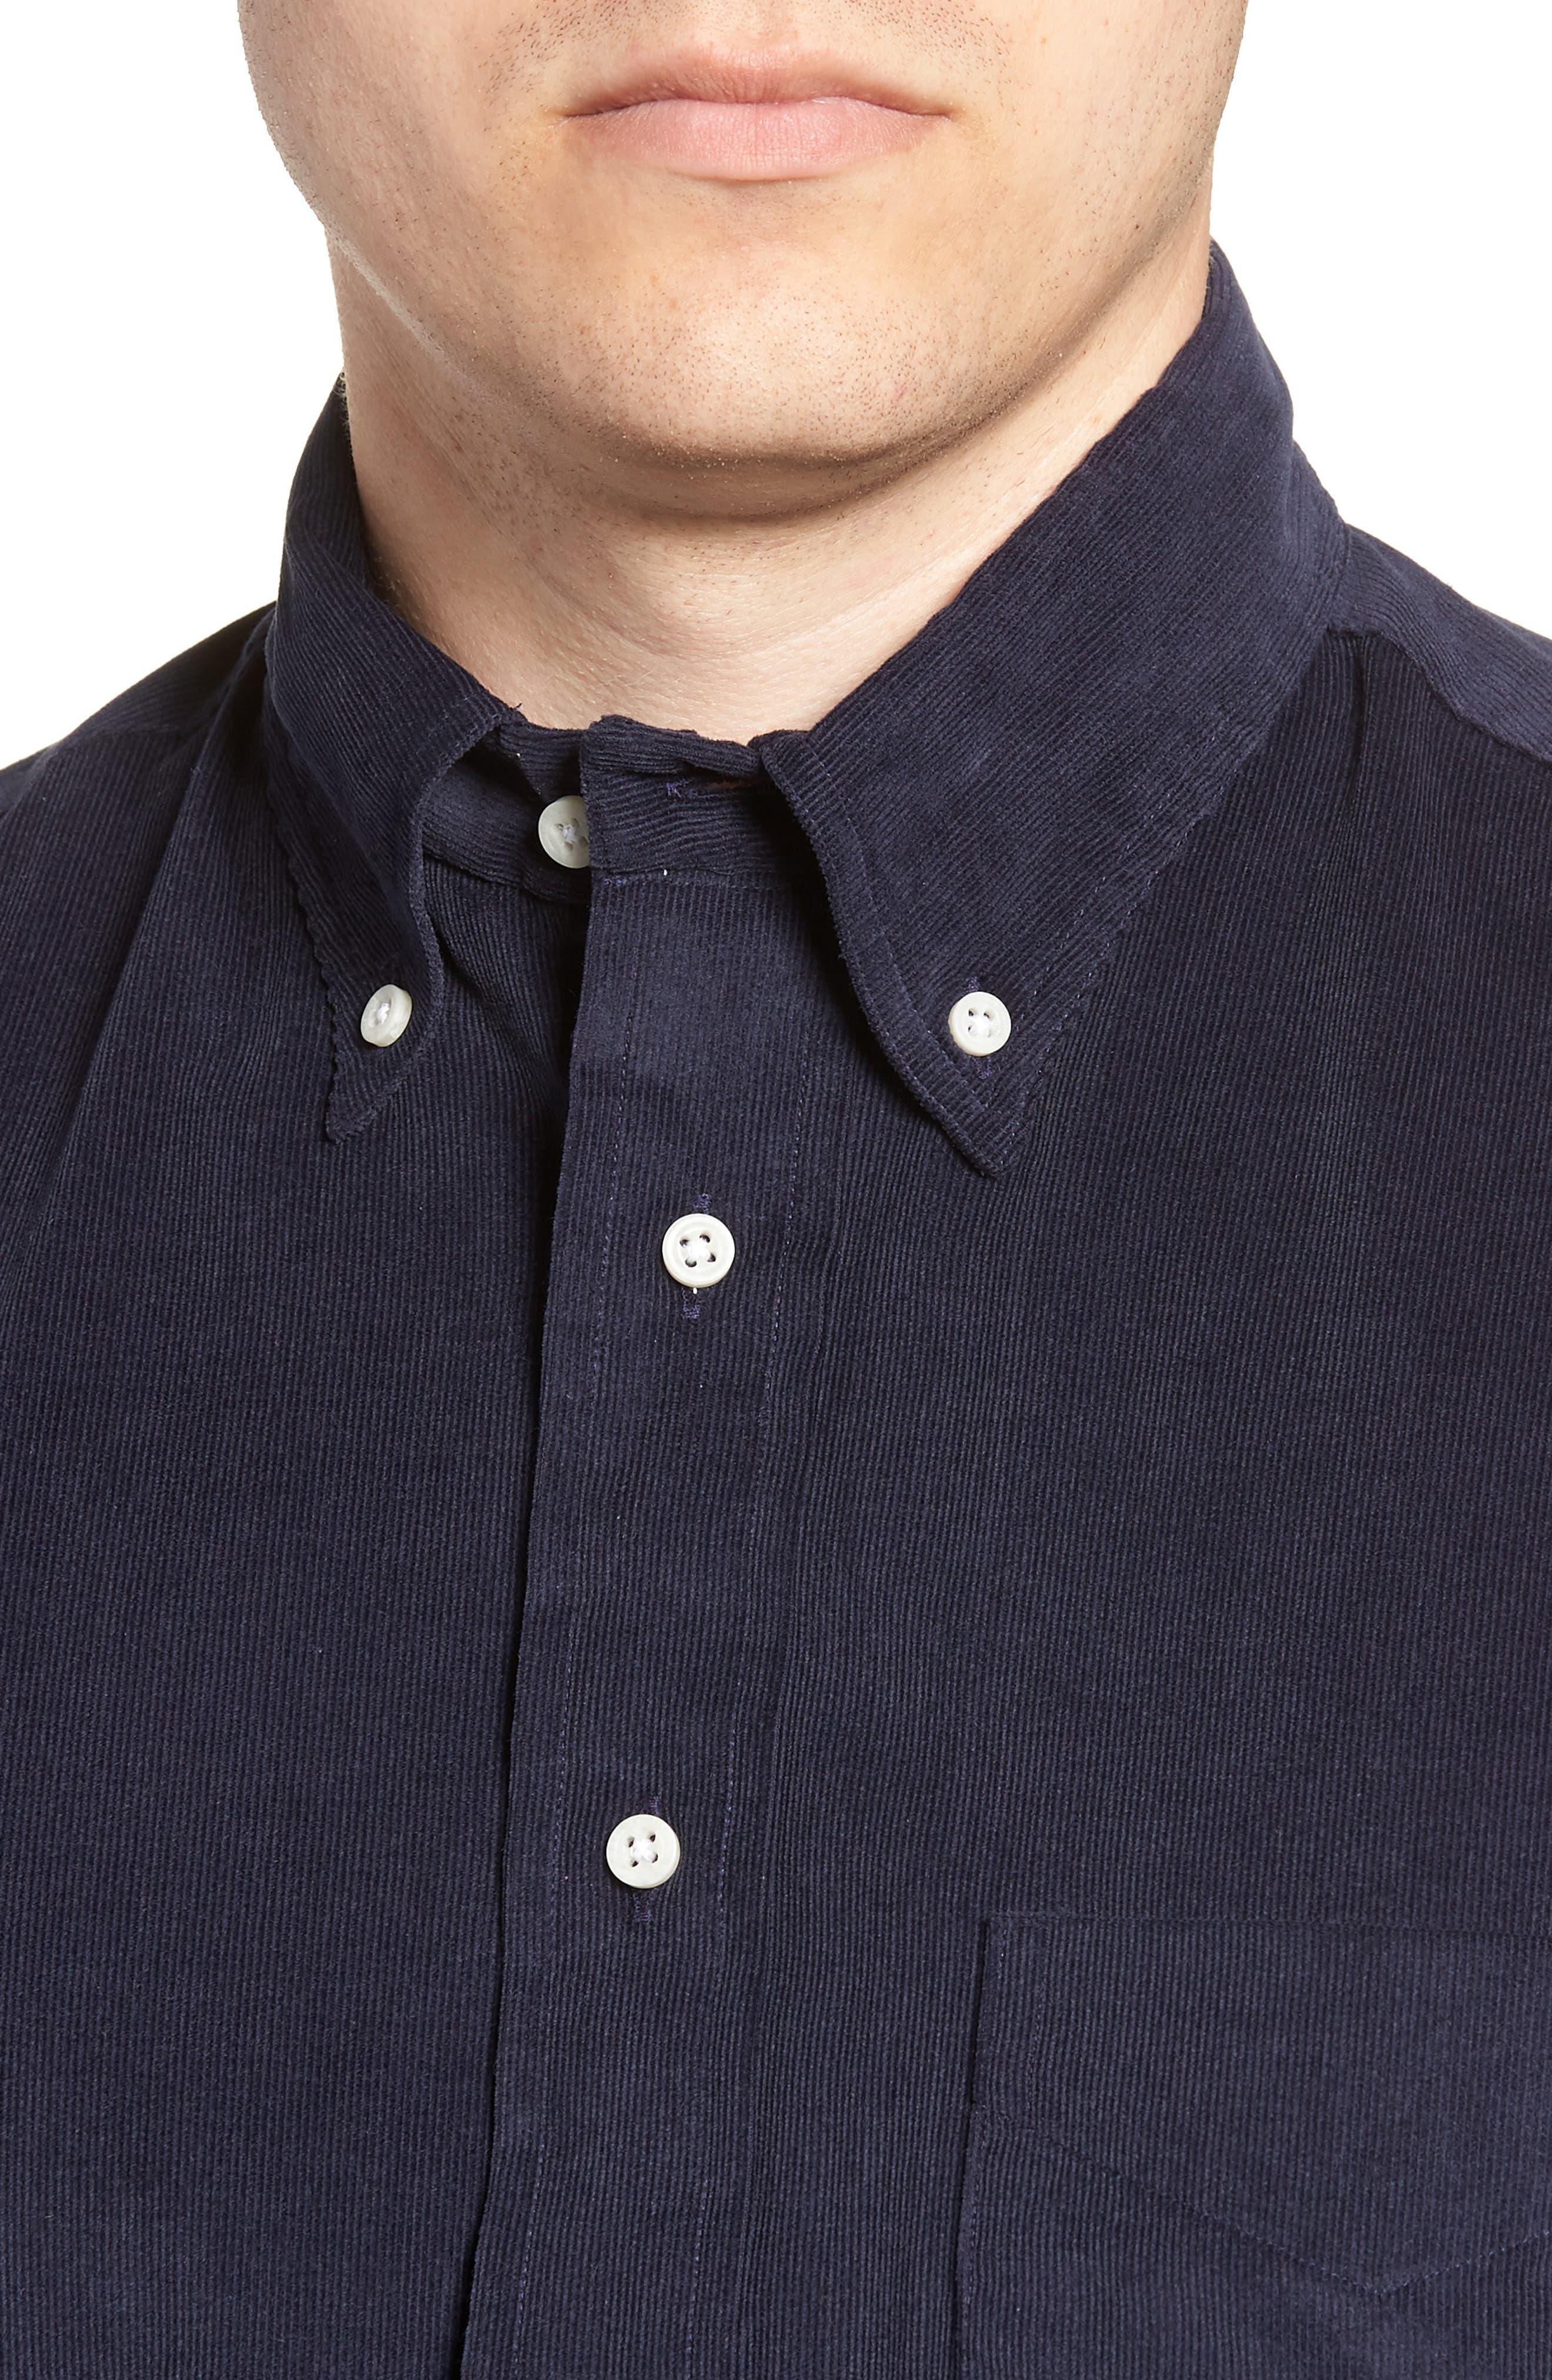 Corduroy Shirt,                             Alternate thumbnail 2, color,                             400